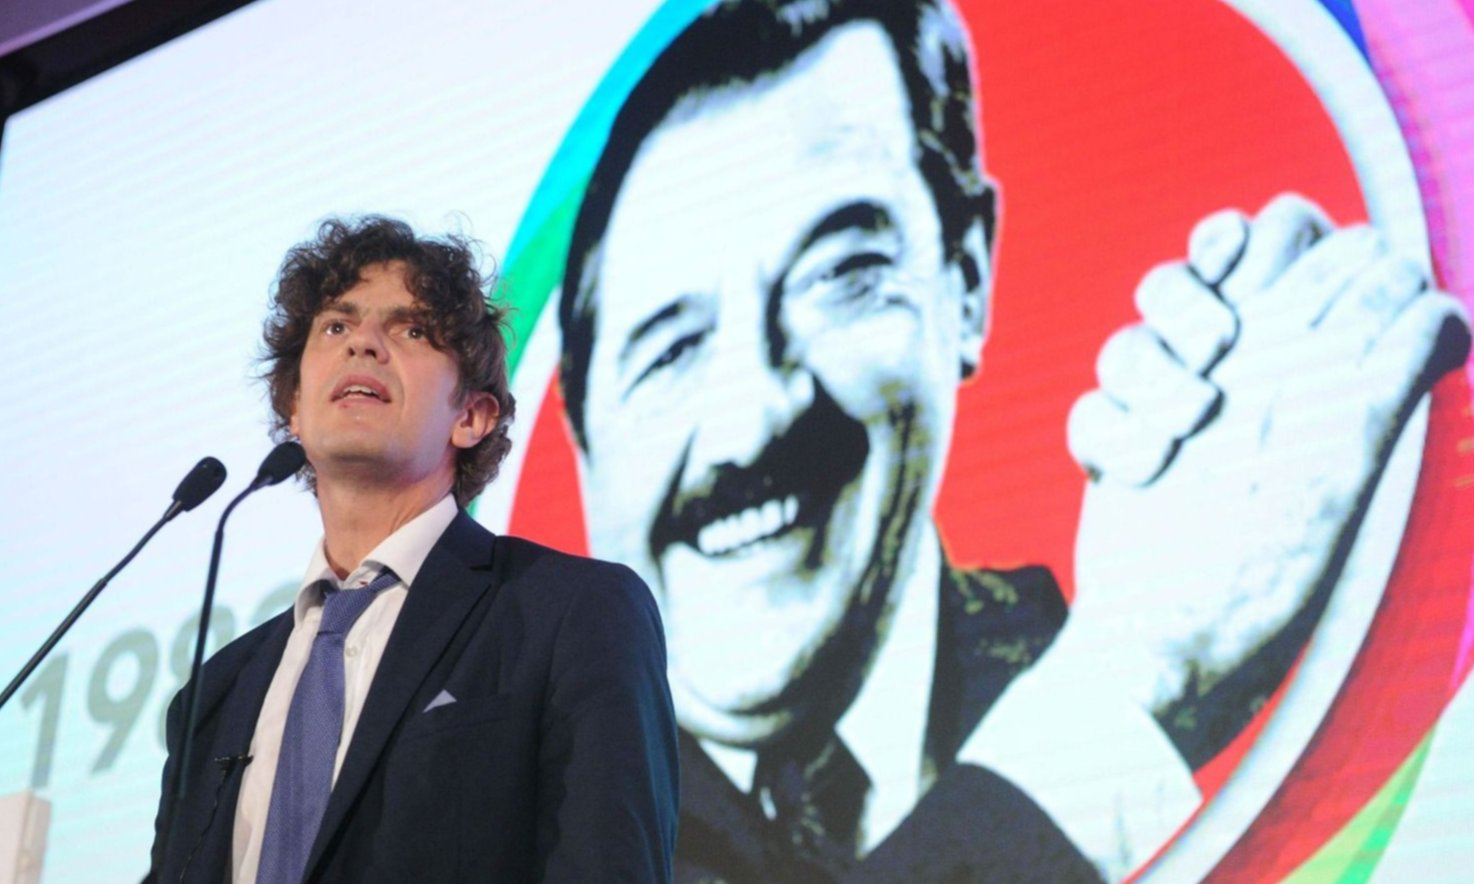 Lousteau le quita dirigentes a Bazze y erosiona el bloque de Salvador